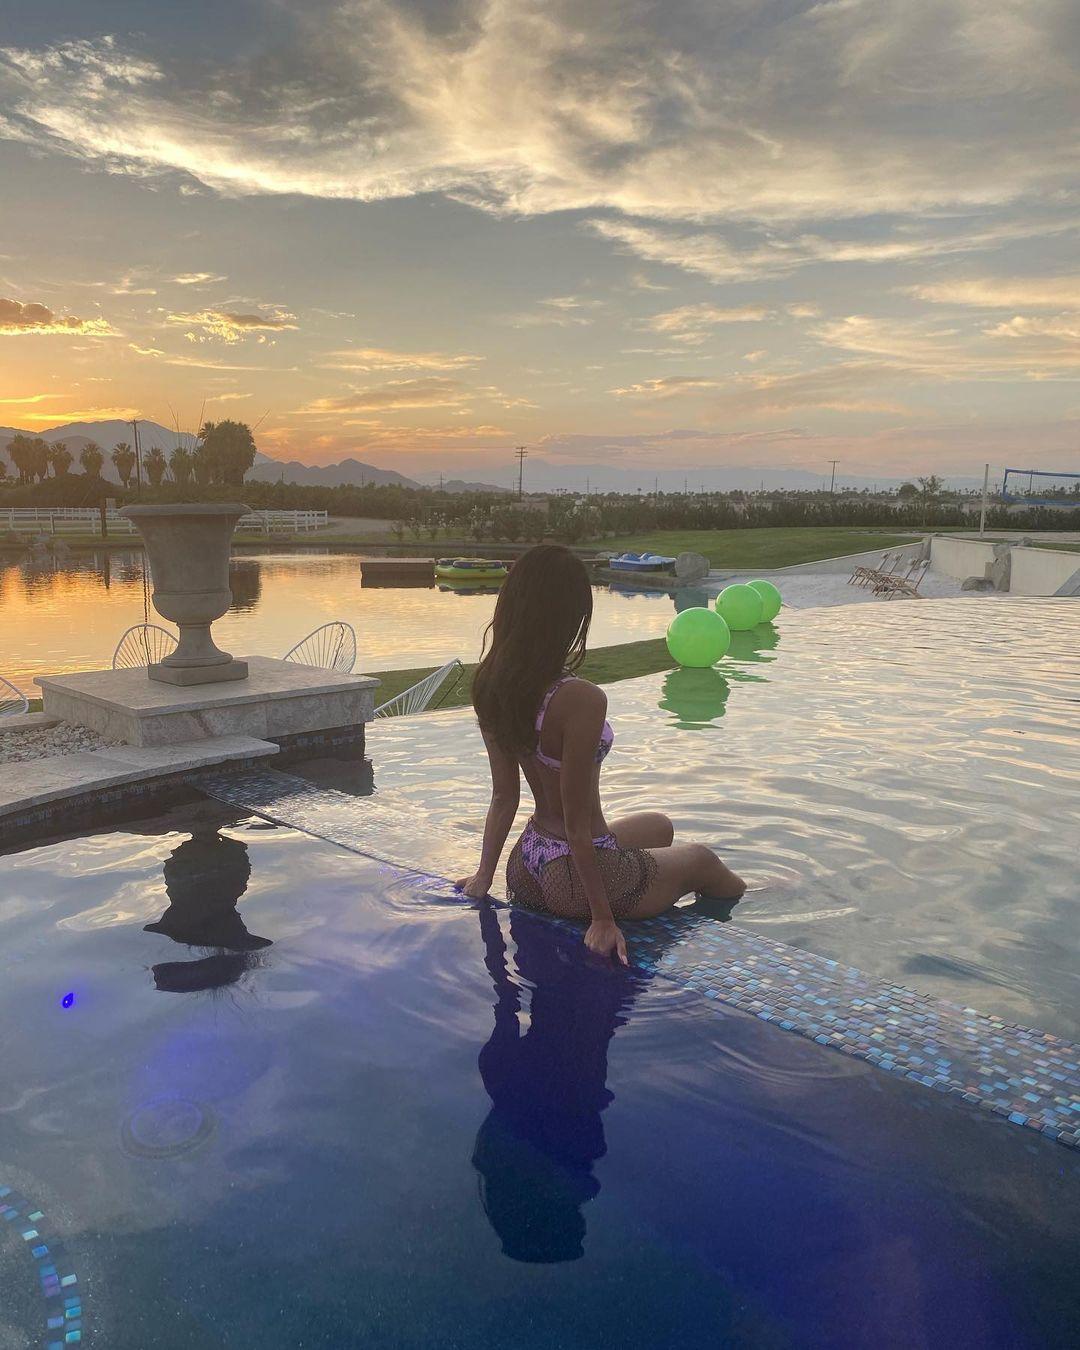 Sydney Chase, a modelo que faz tremer o clã Kardashian